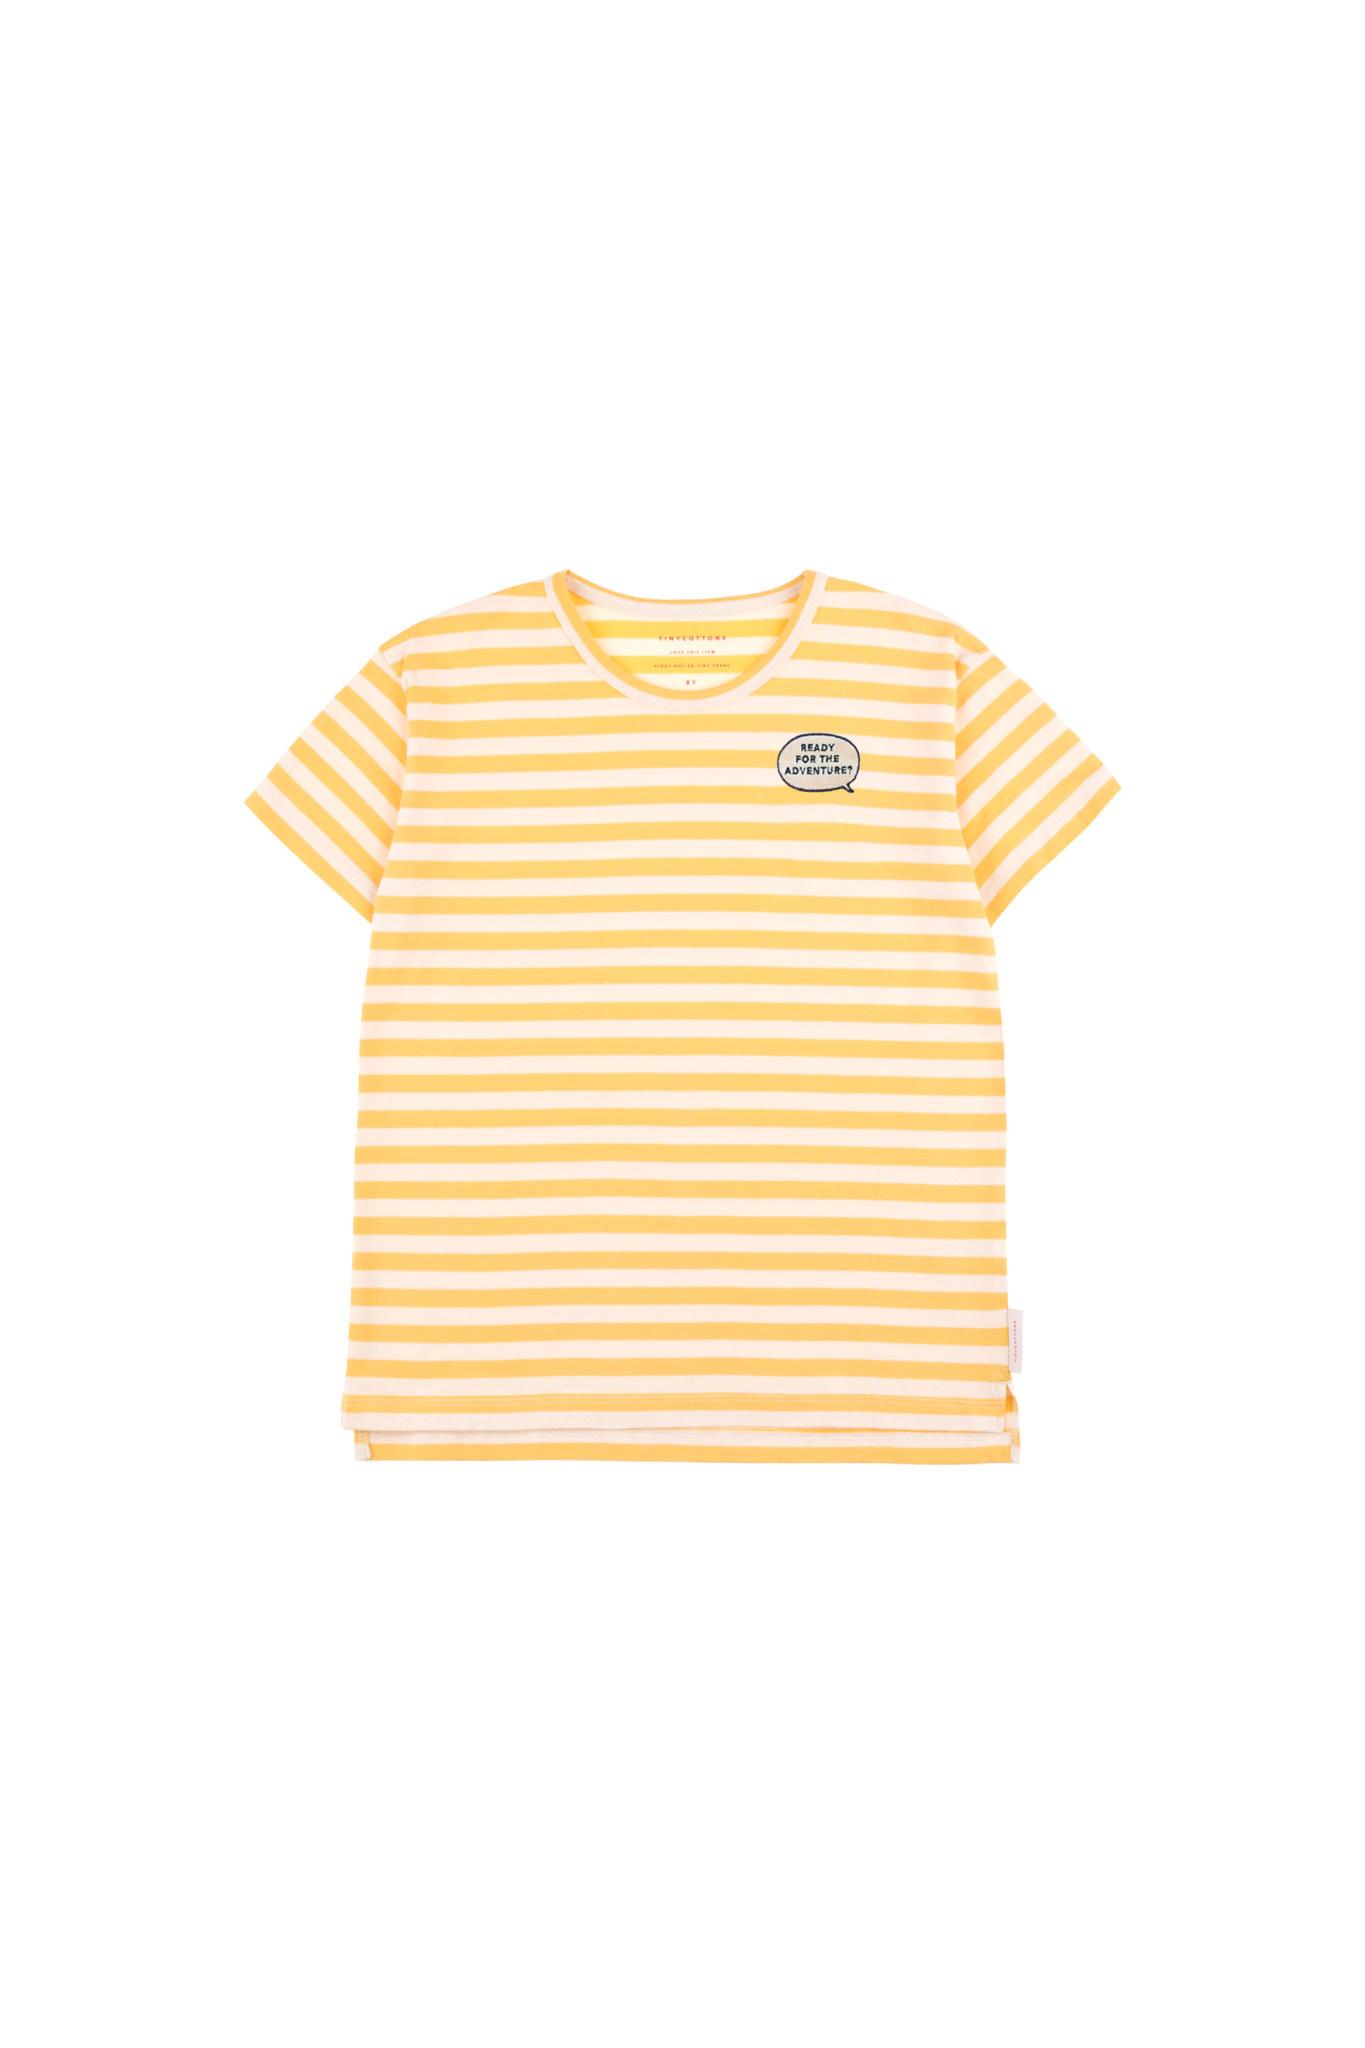 Tiny Cottons Adventure stripes ss TEE